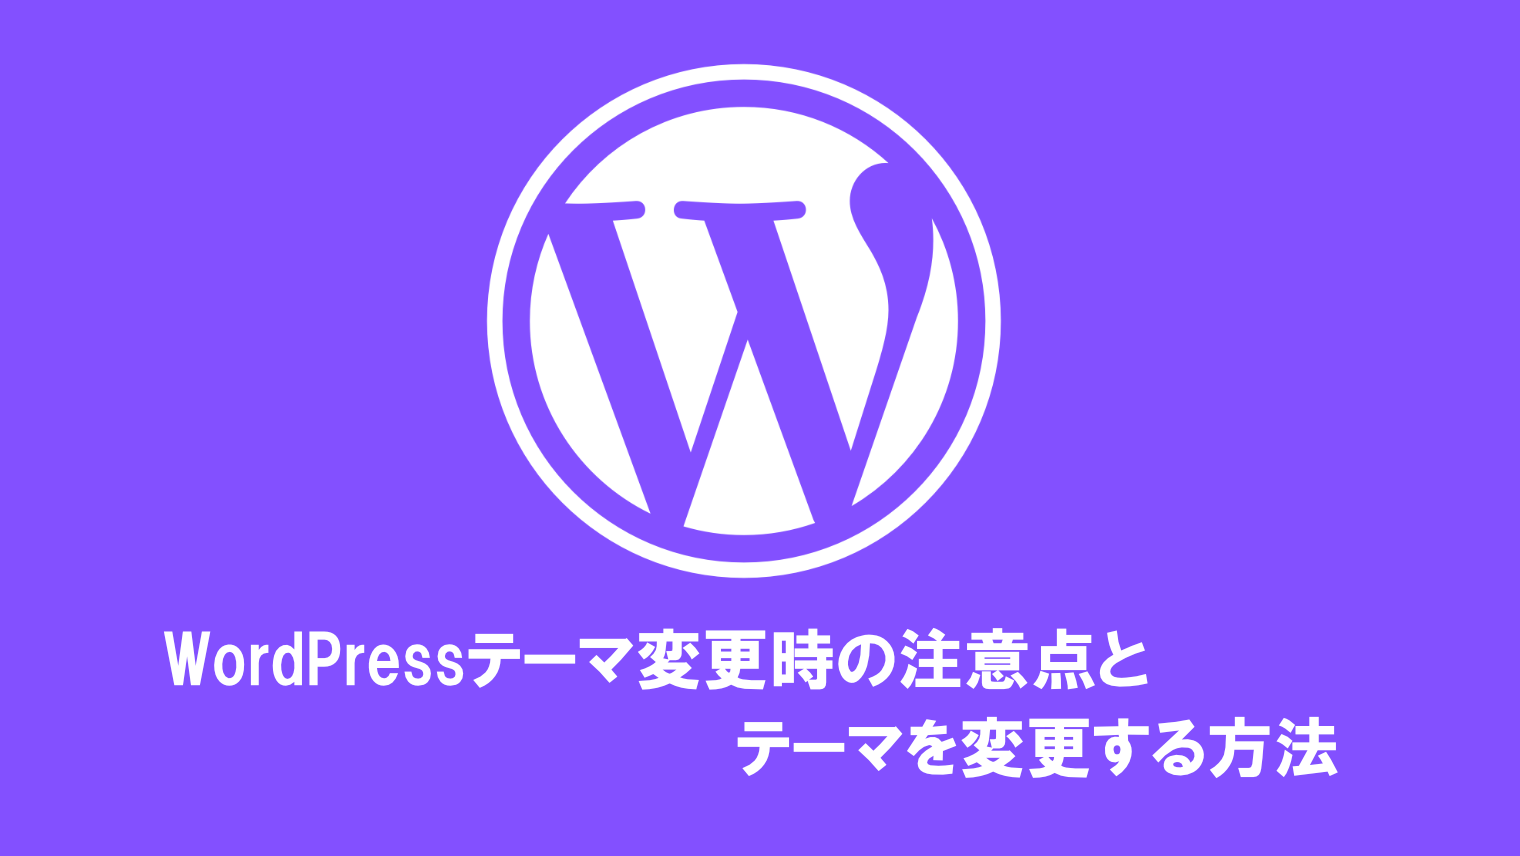 【WordPress】テーマ変更時の注意点とテーマ変更方法を解説!